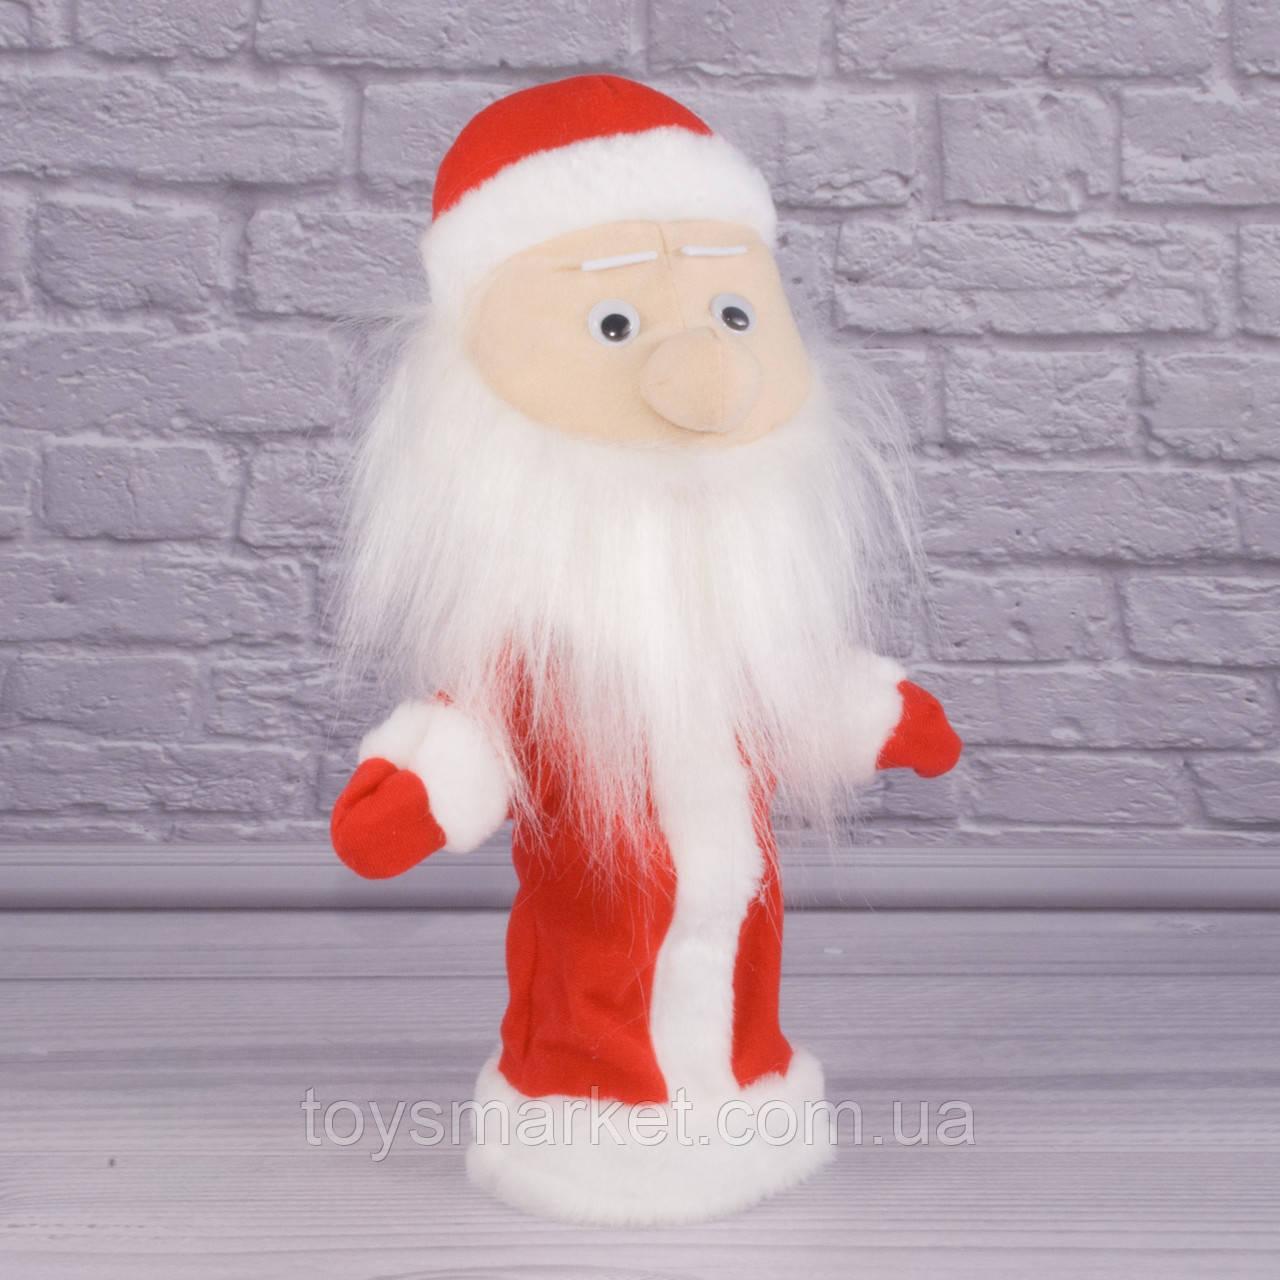 Игрушка рукавичка для кукольного театра Дед Мороз, кукла перчатка на руку